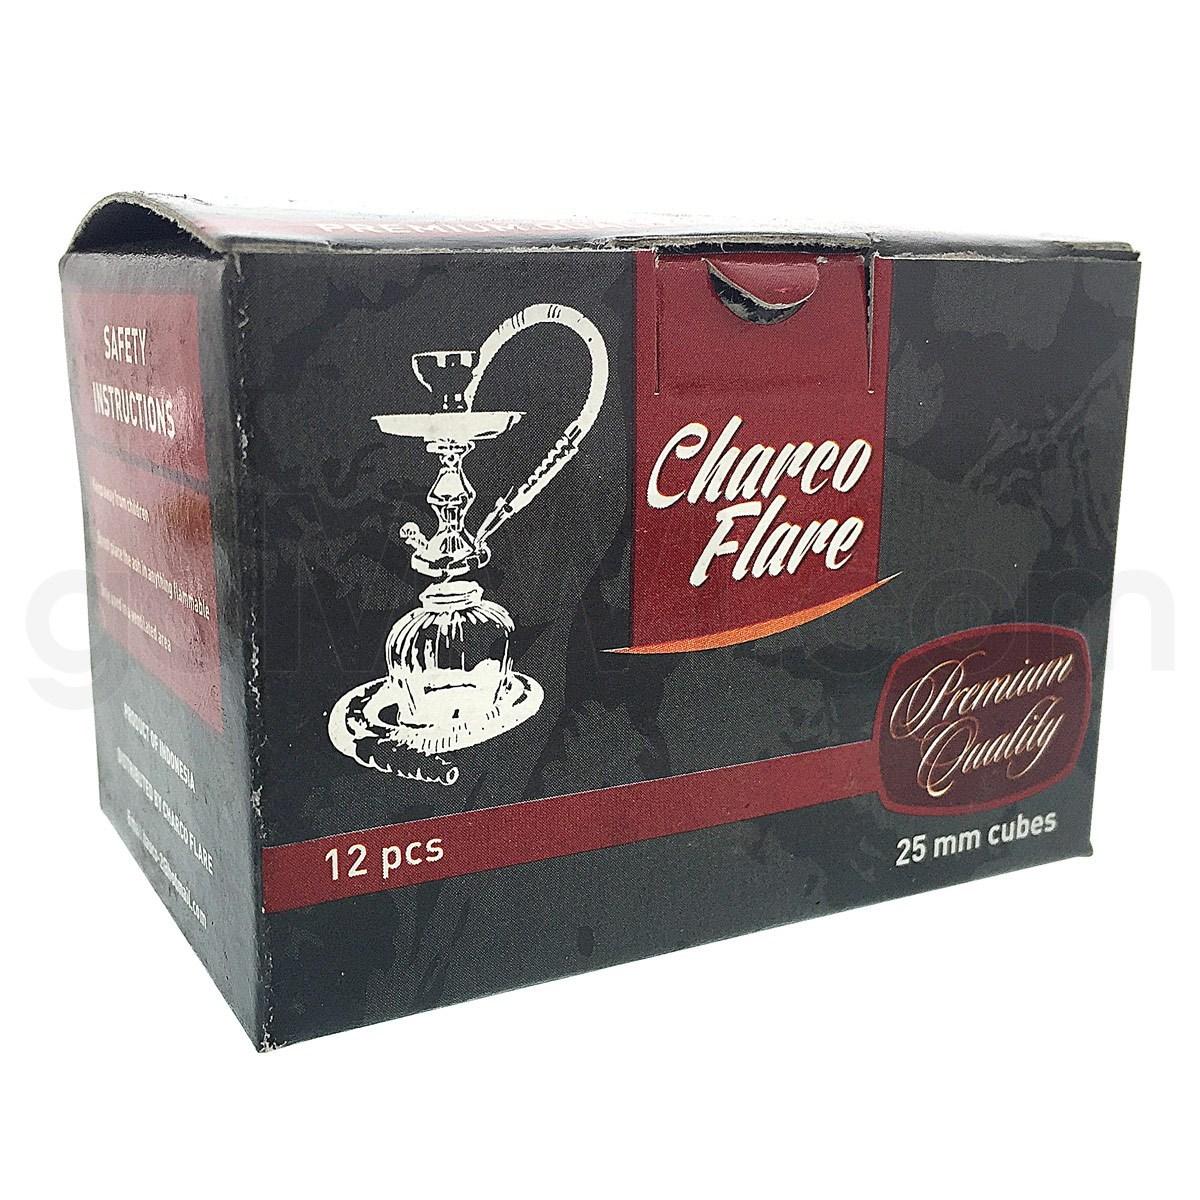 CHARCO FLARE PREMIUM CHARCOAL